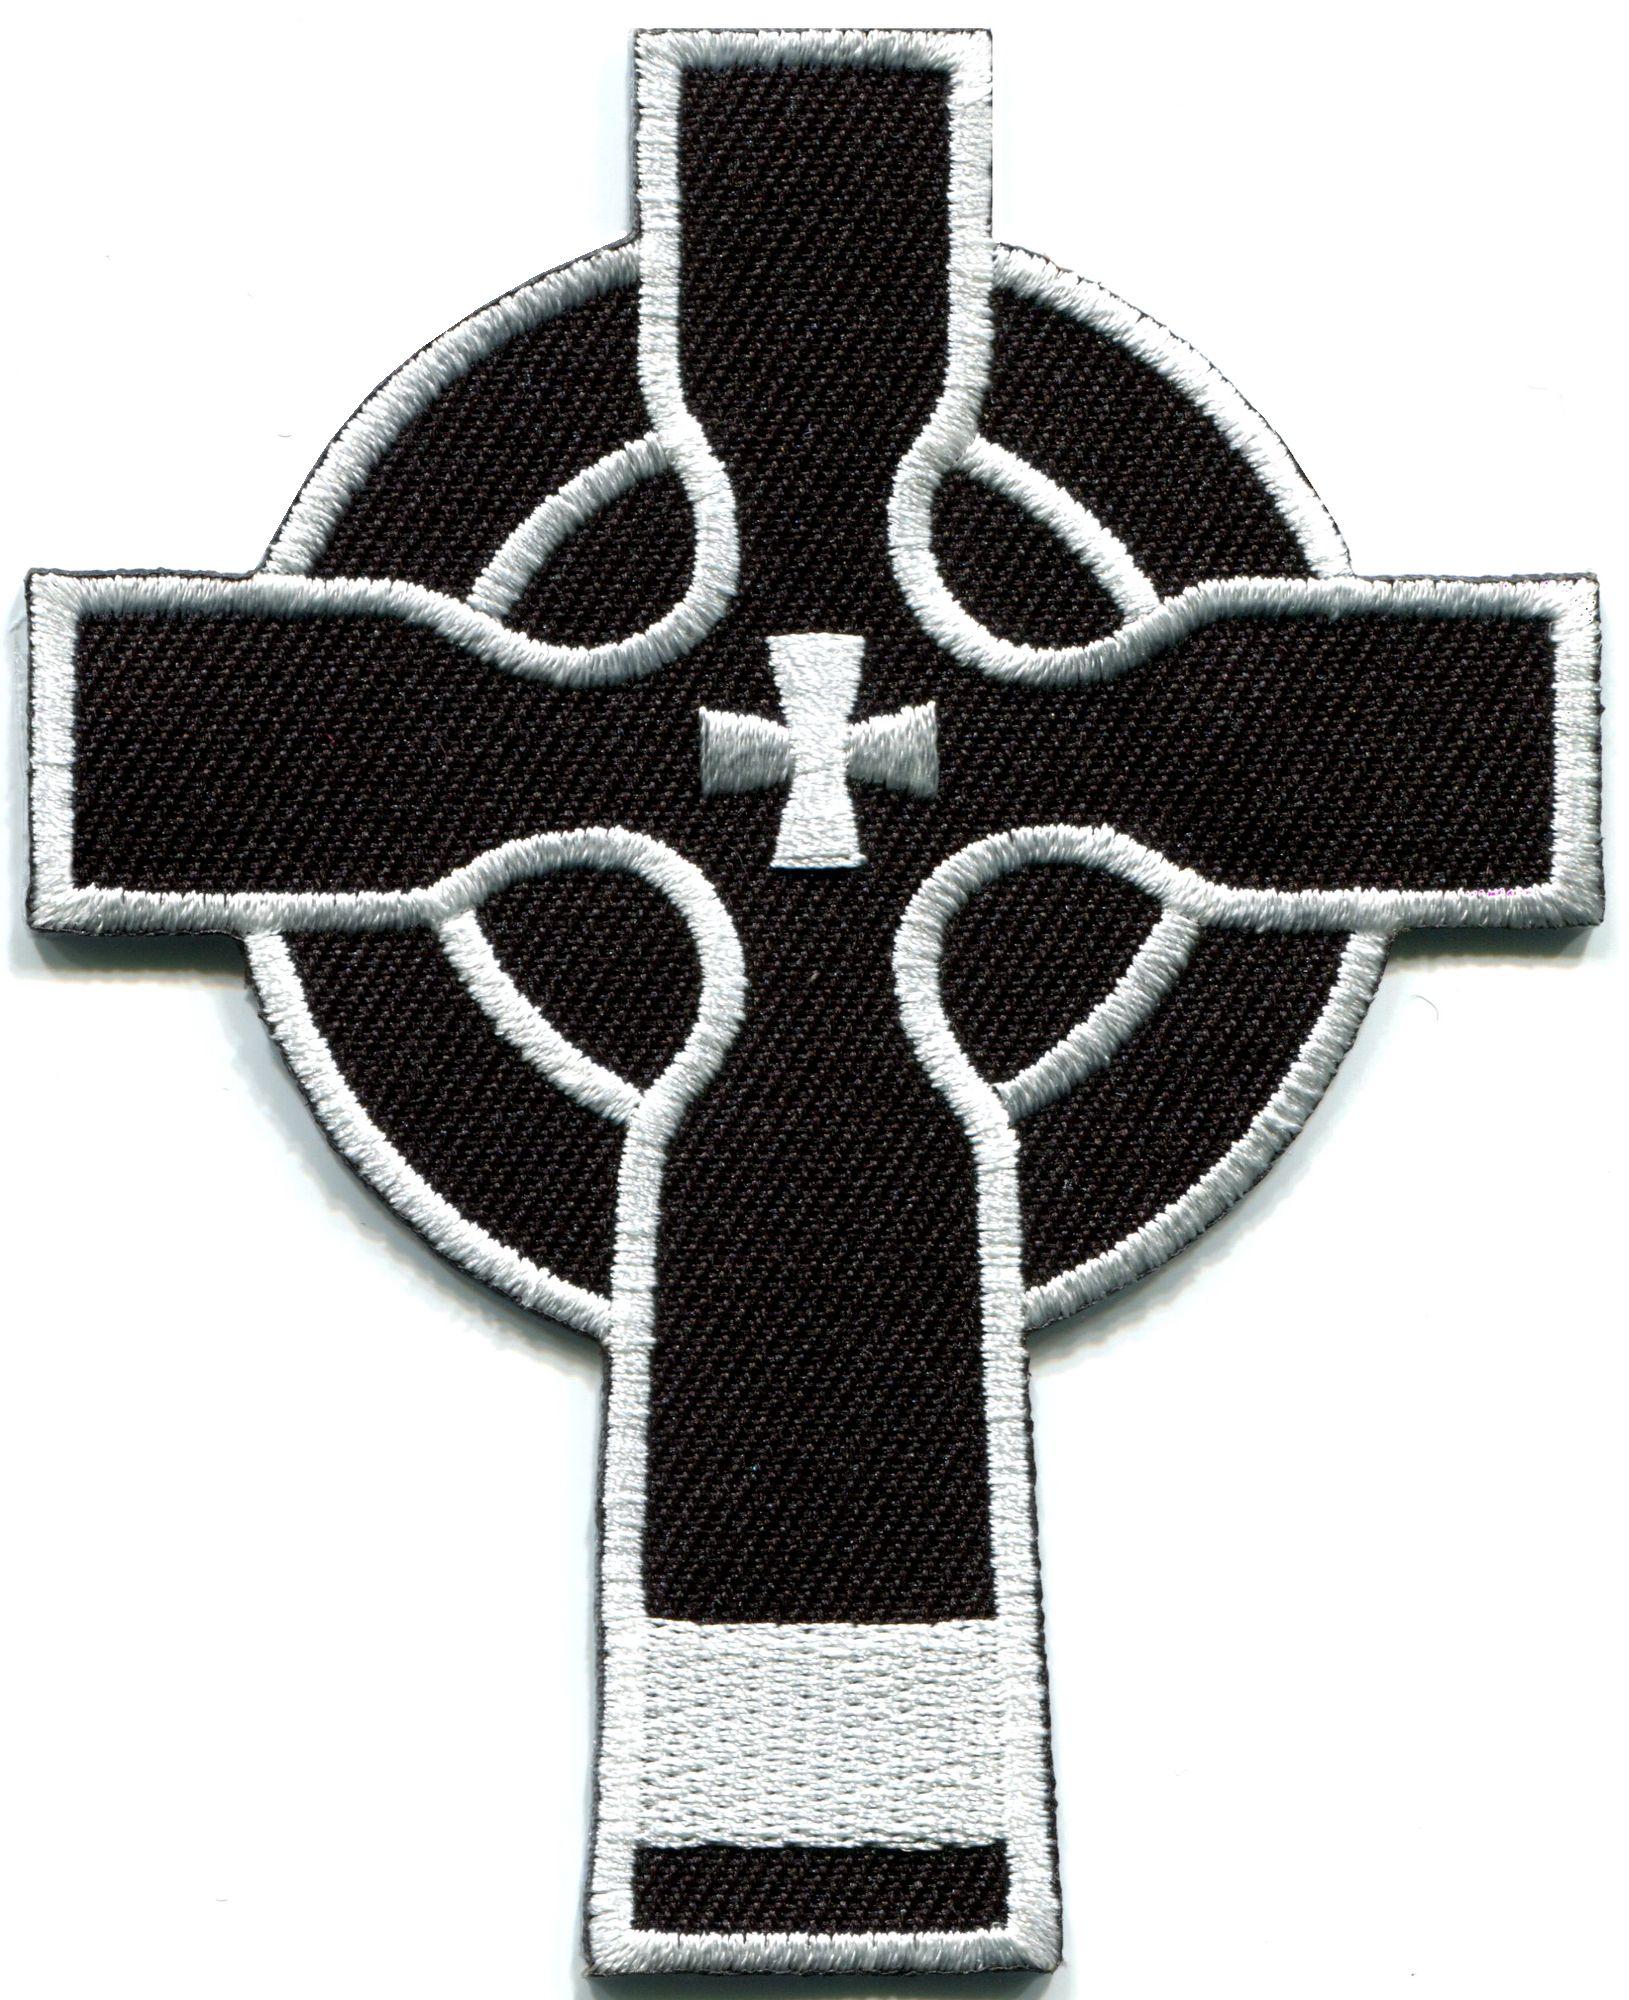 Details about Celtic cross Irish goth biker tattoo wicca